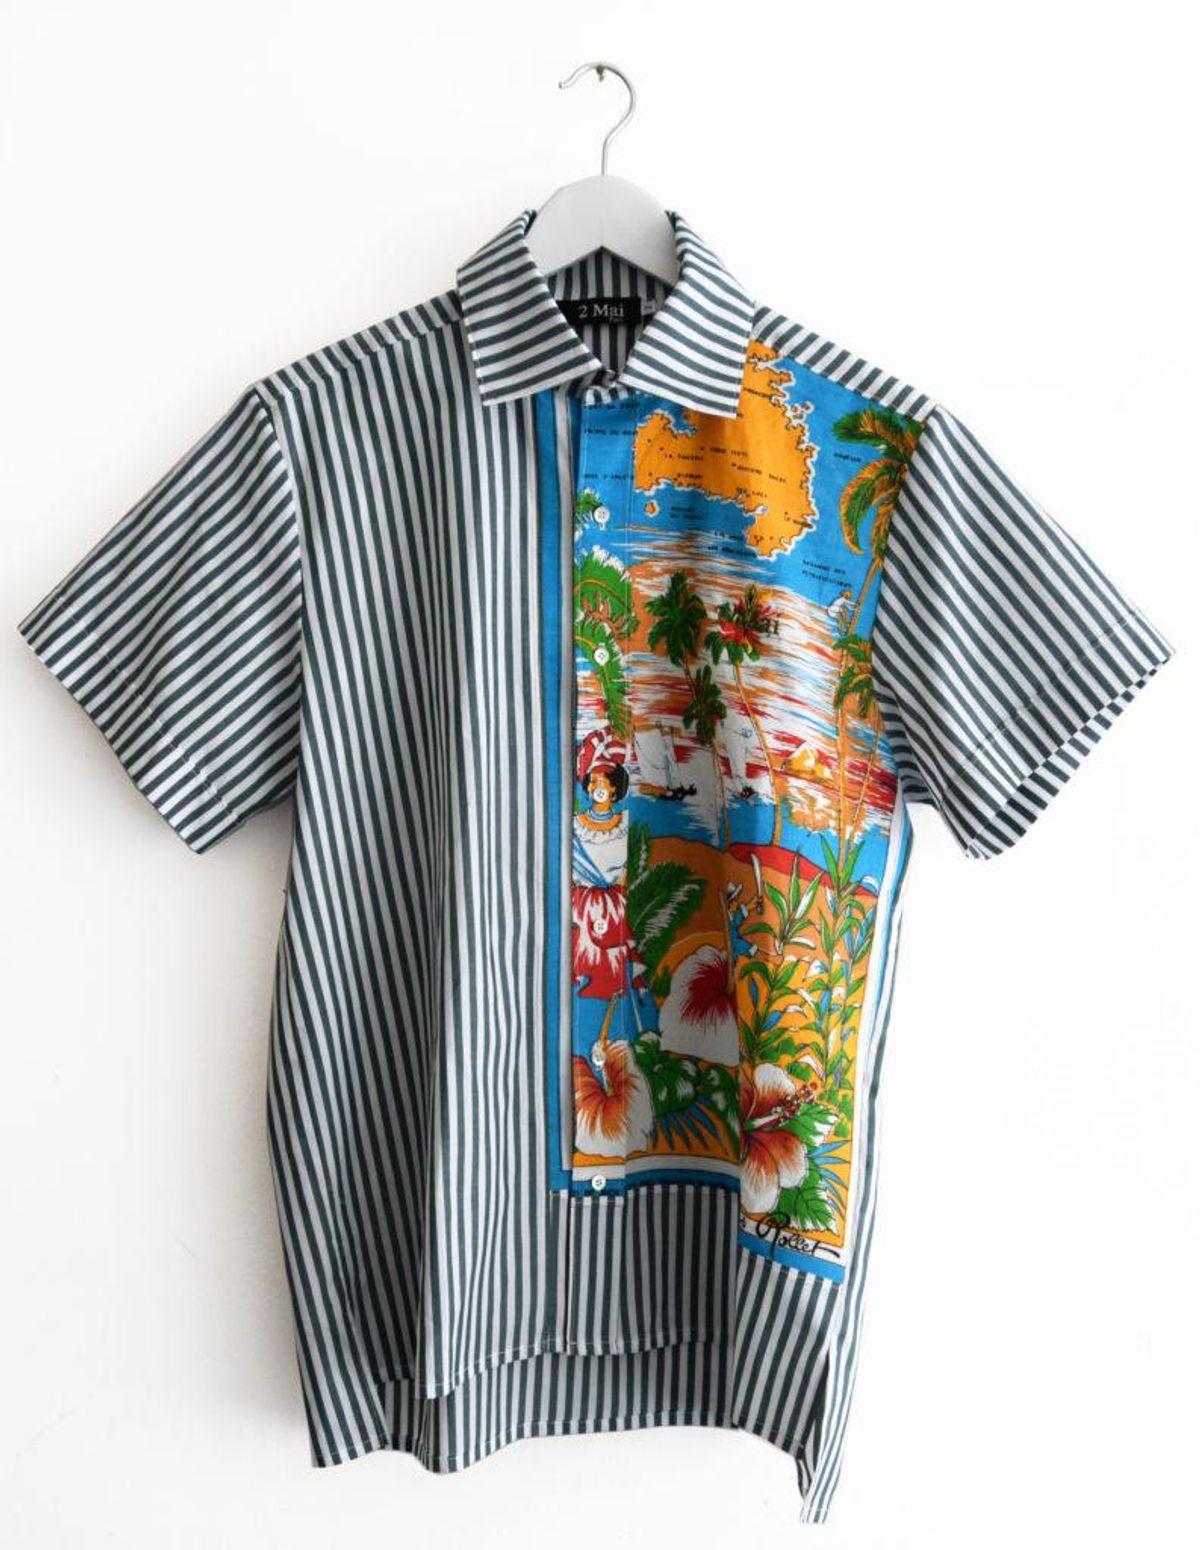 Tableau Shirt N°18